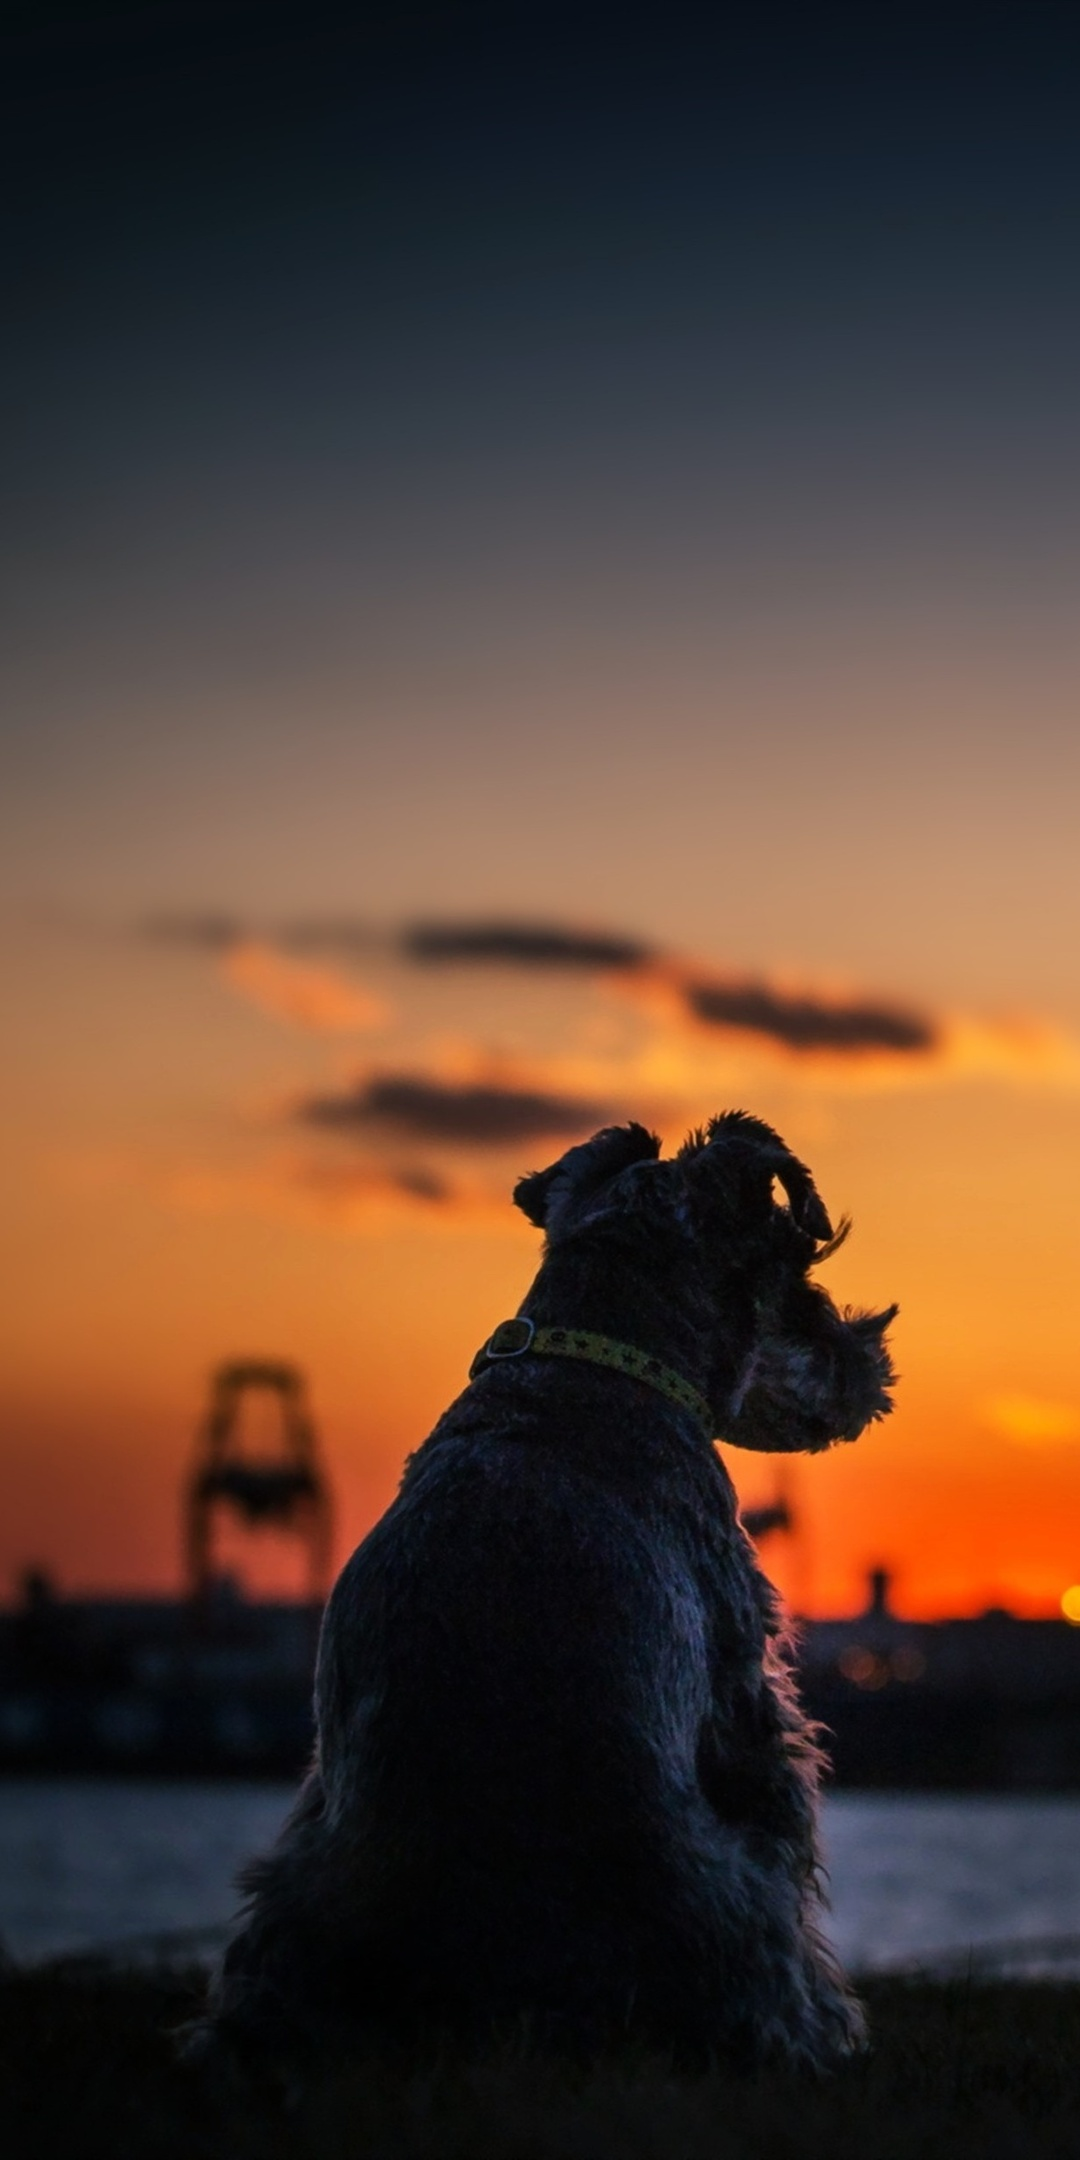 dog-sunset-silhouette-4k-ju.jpg